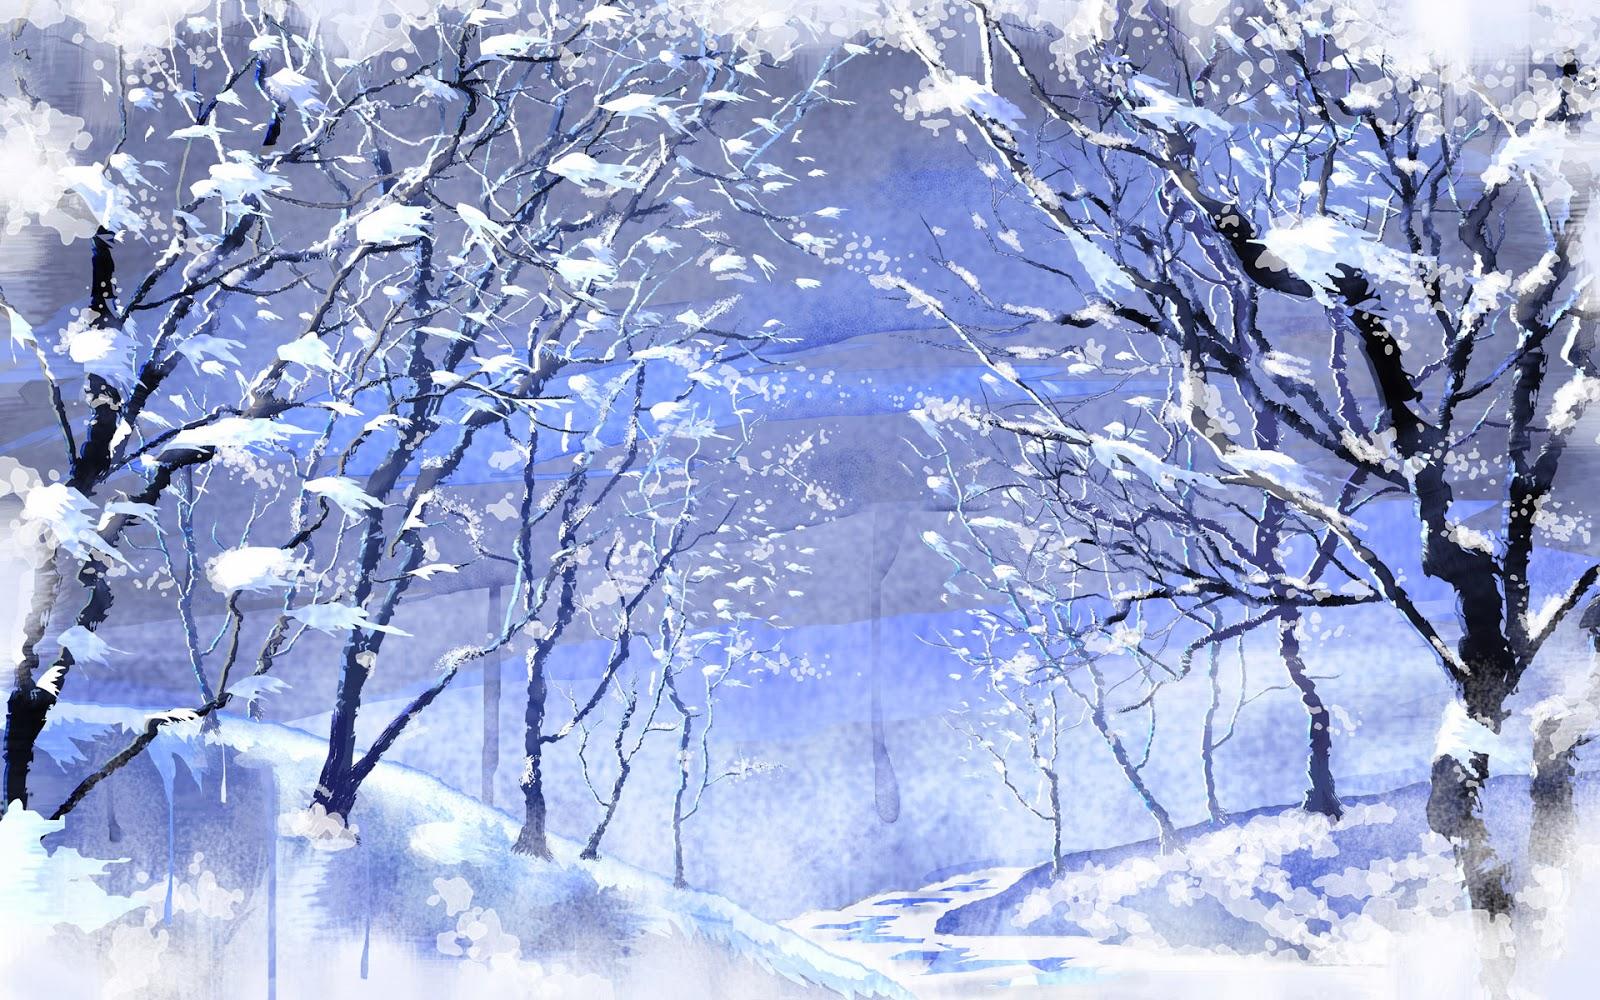 Frozen christmas wallpapers hd wallpapers blog - Wallpaper for frozen ...